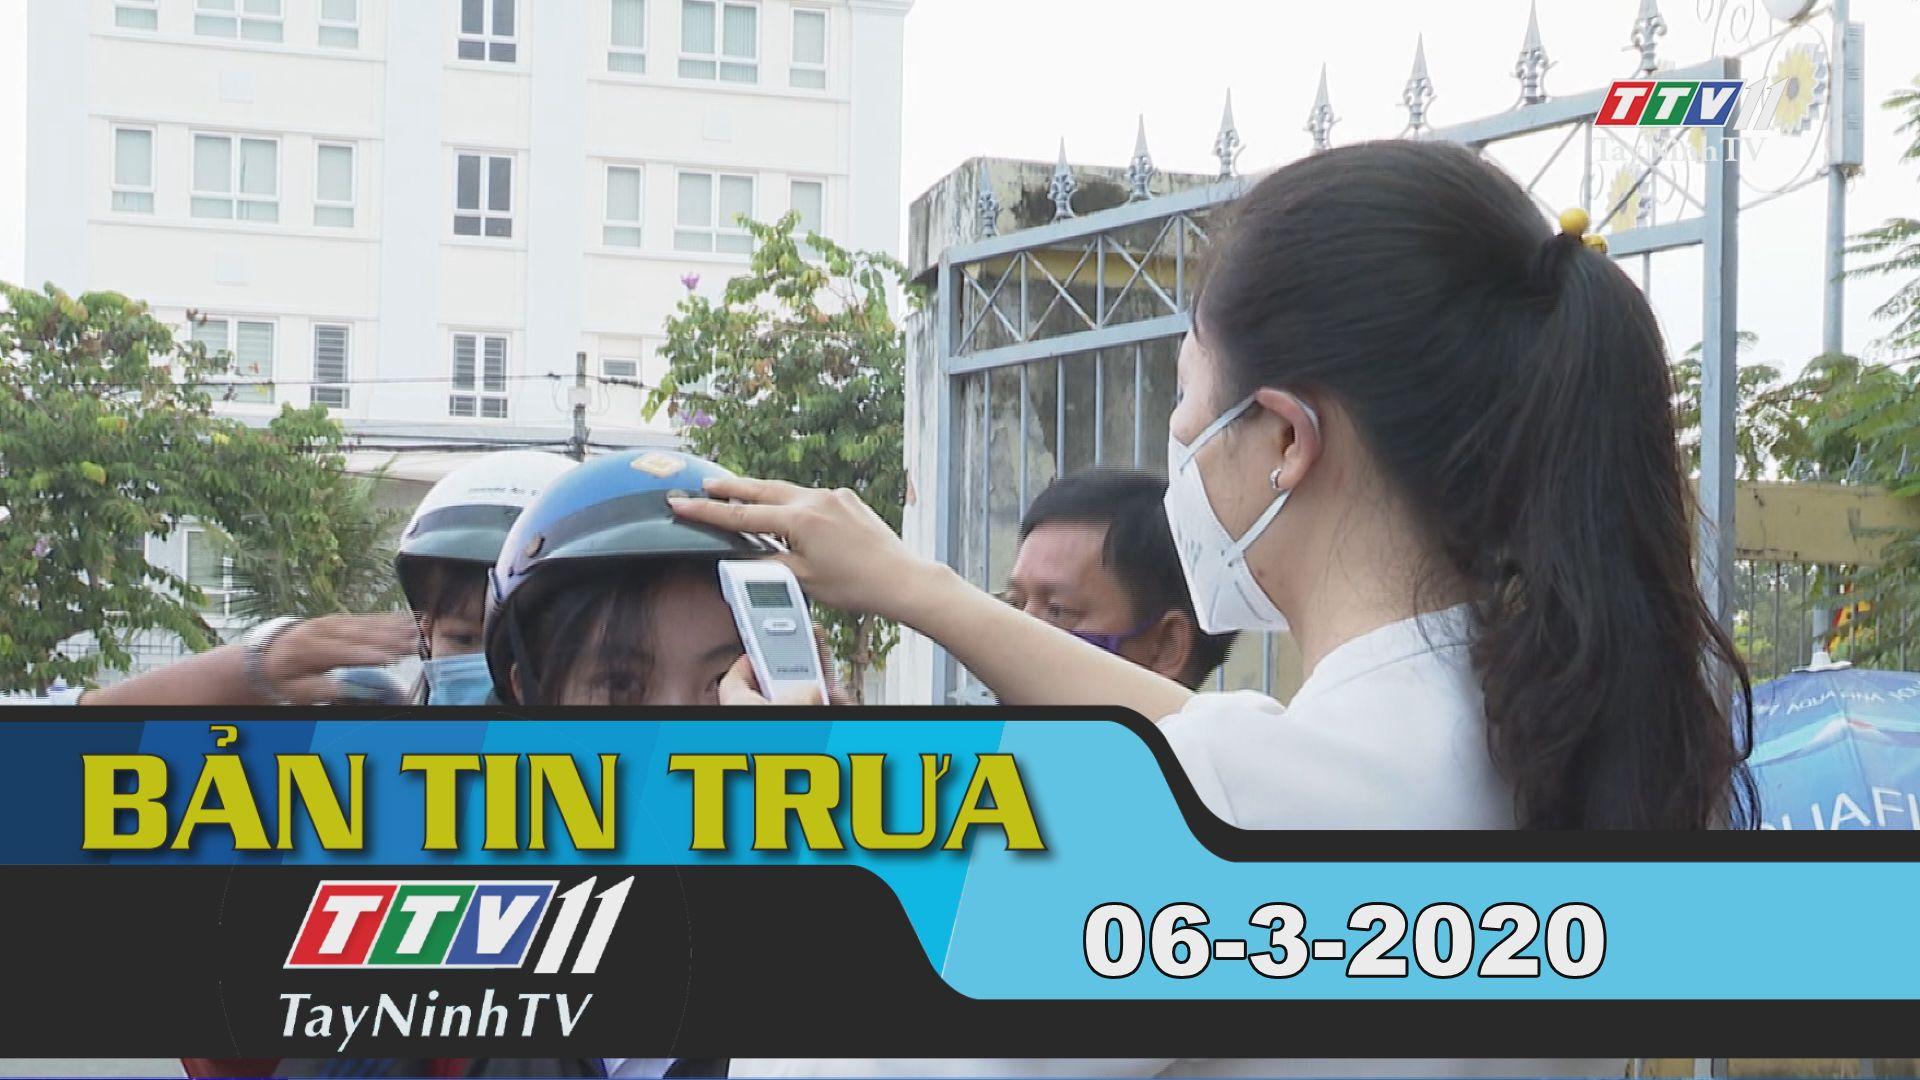 Bản tin trưa 06-3-2020 | Tin tức hôm nay | TayNinhTV